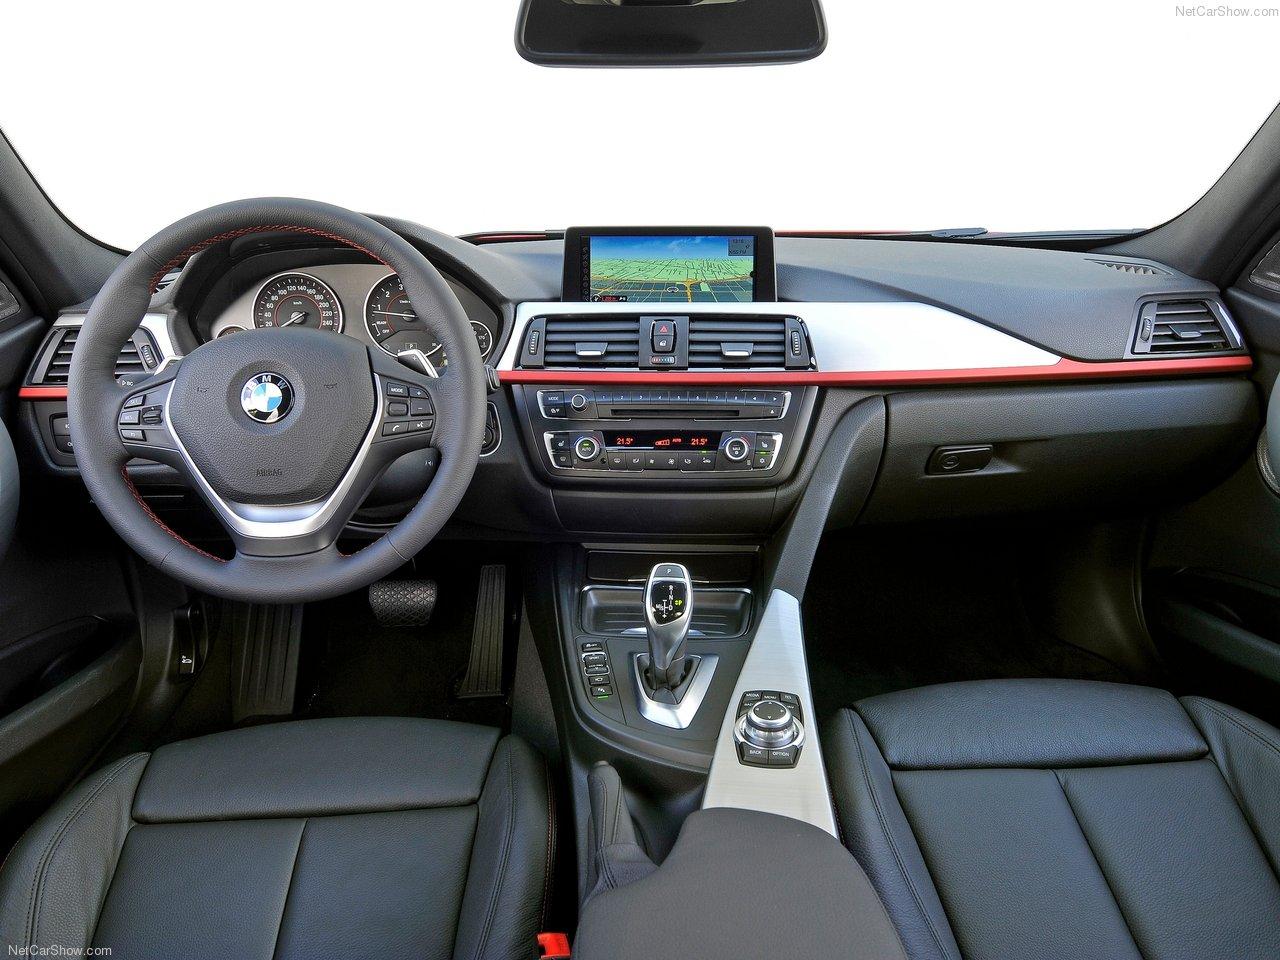 BMW-3-Series-2012-1280-96.jpg